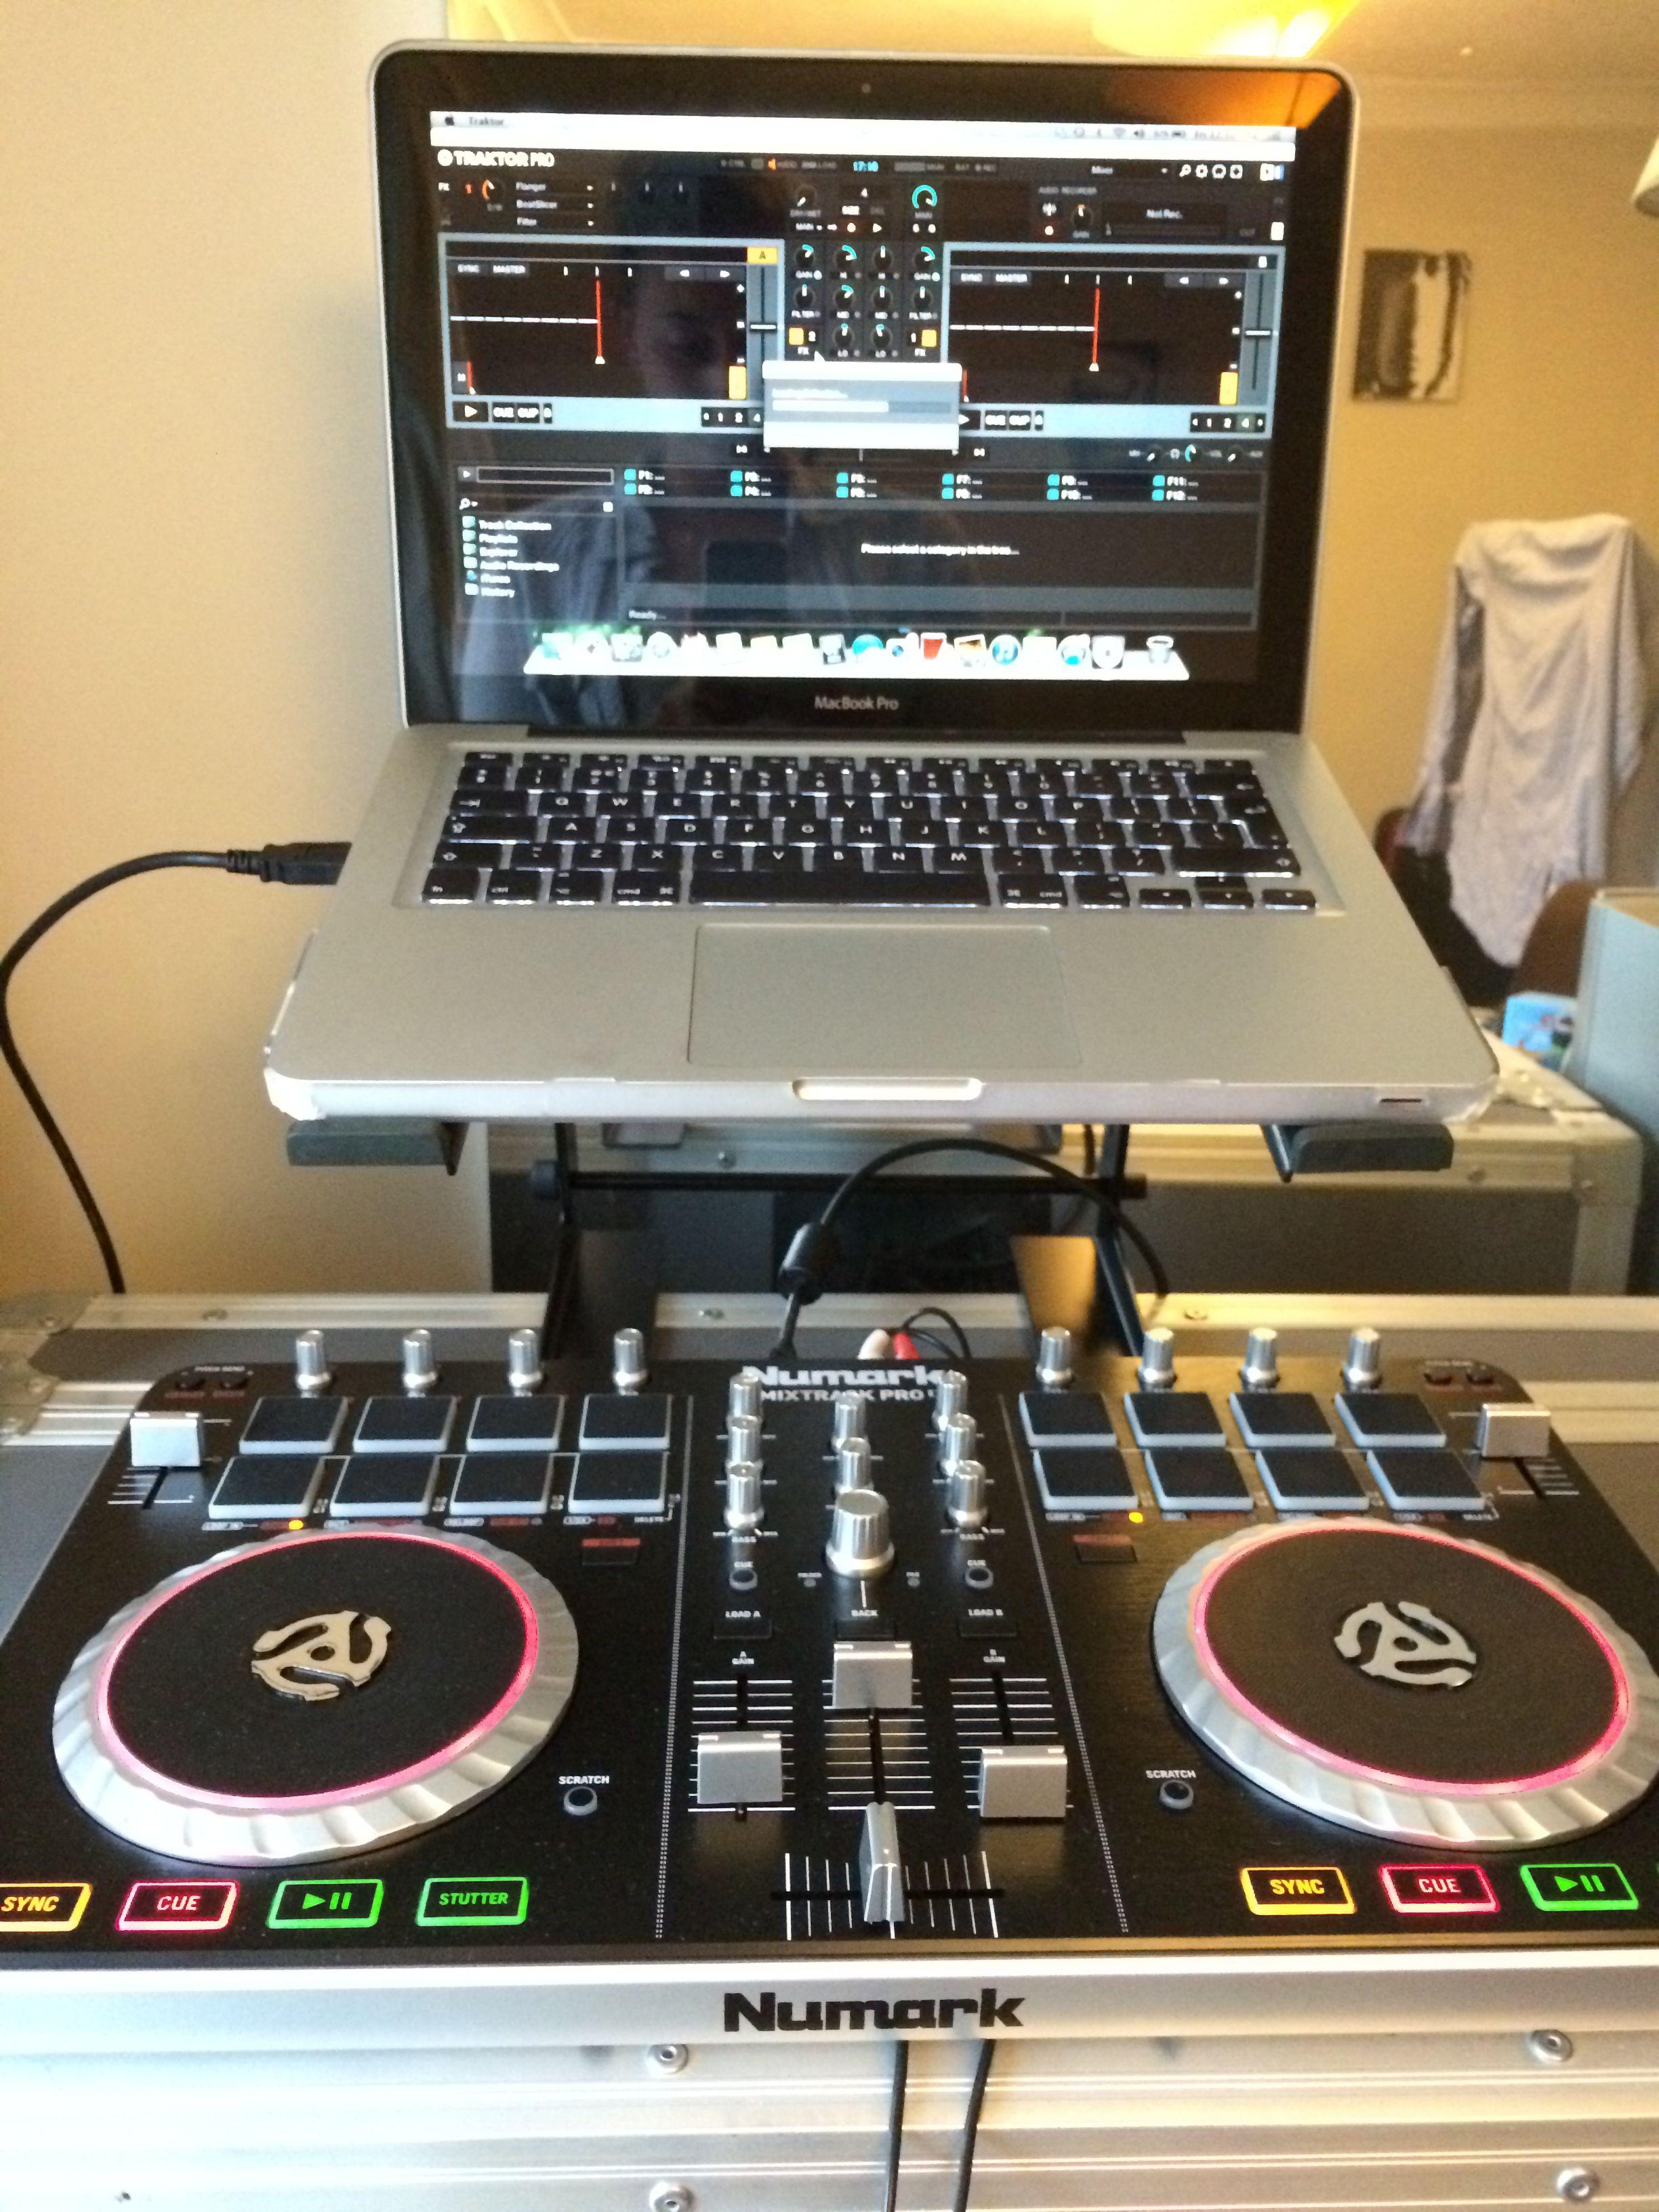 Dj Set Up Numark Mixtrack Pro 2 And Traktor Electronic Products Sync Dj